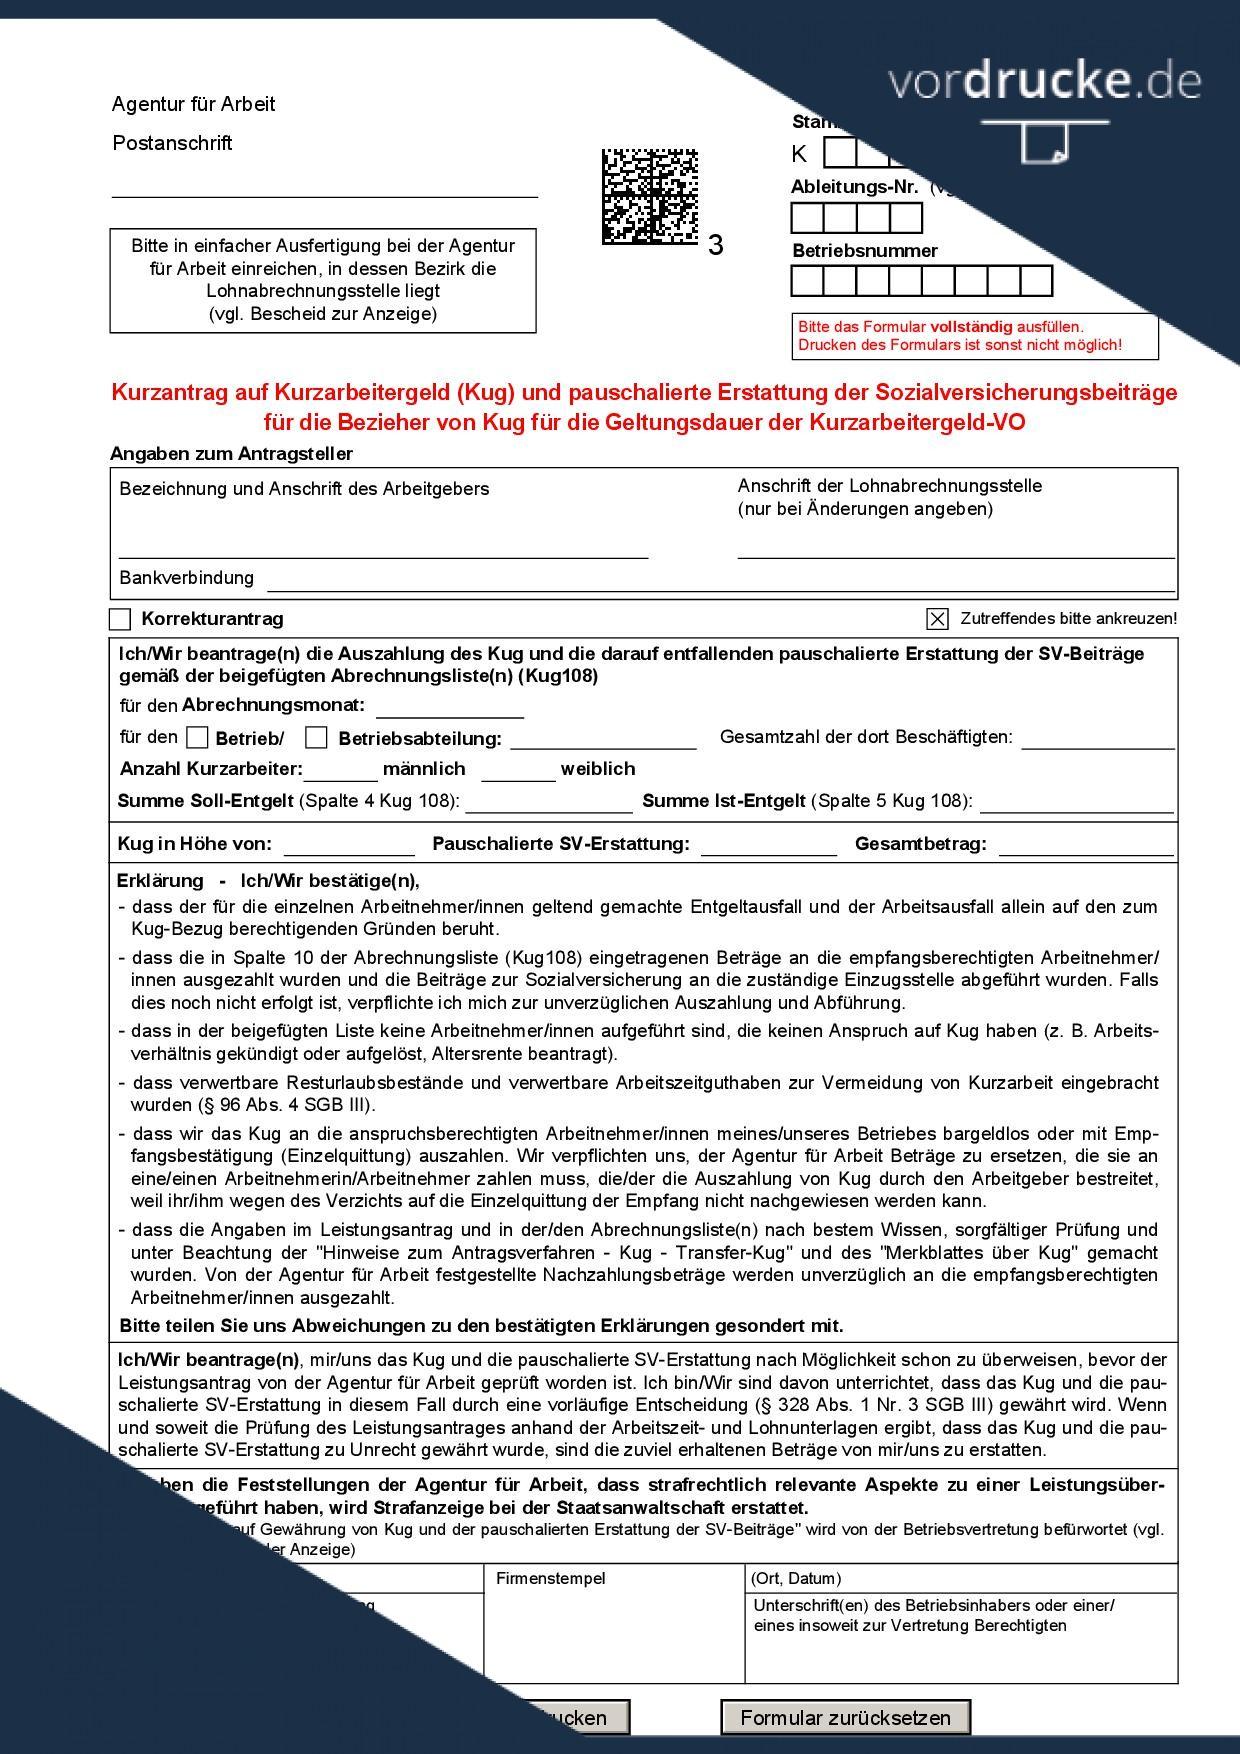 KurzAntrag-auf-Kurzarbeitergeld-Arbeitsausfall-durch-Corona-Virus